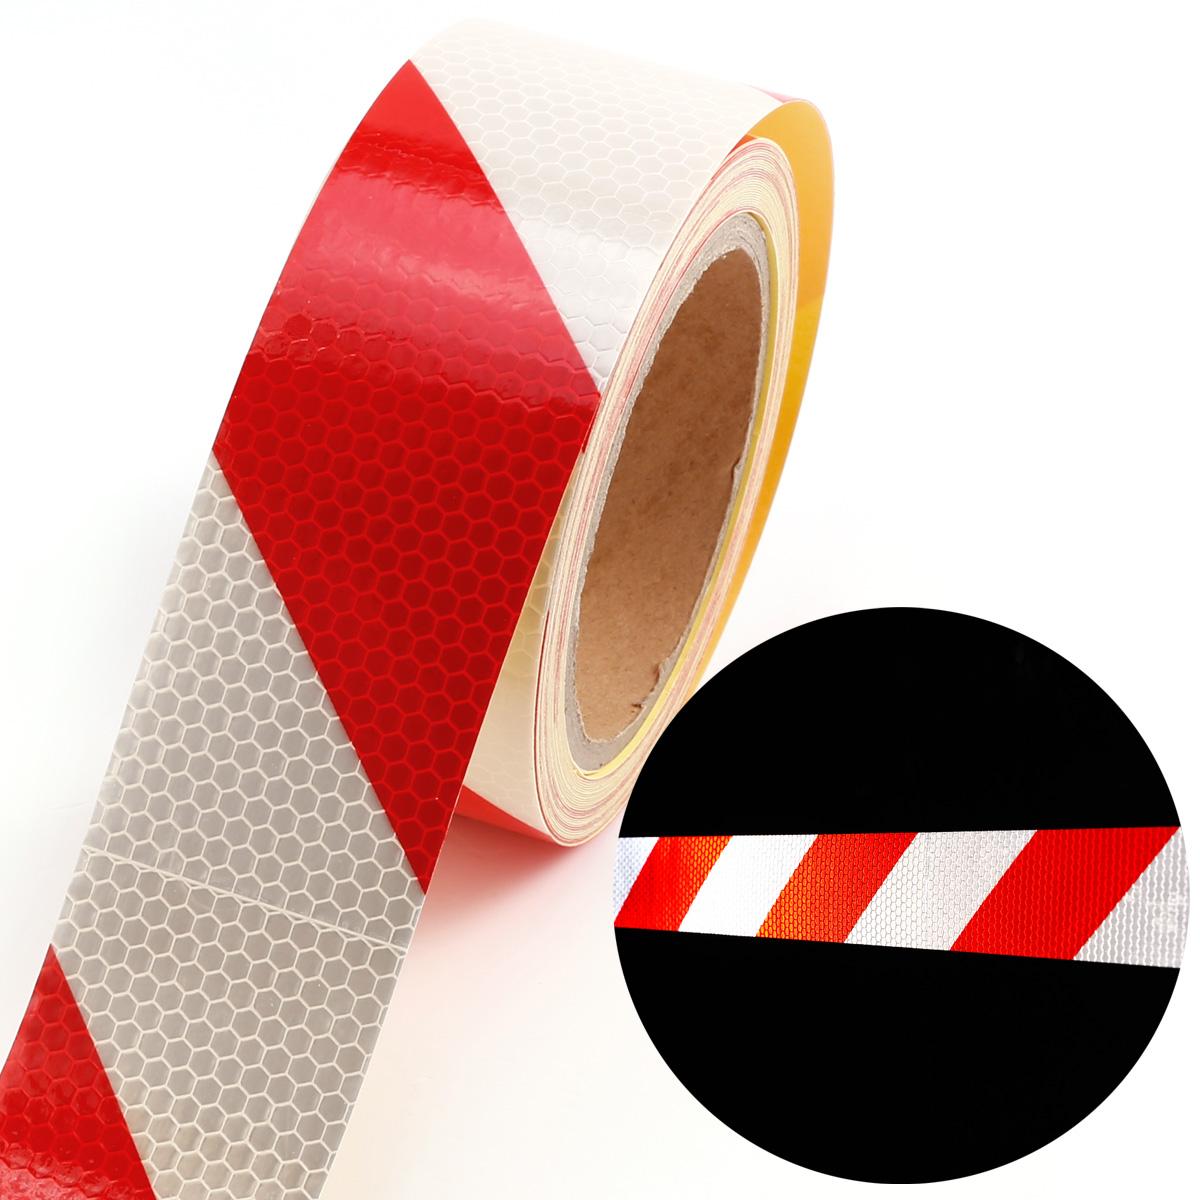 10m bande r fl chissant ruban adh sif autocollant s curit v lo moto rouge blanc ebay. Black Bedroom Furniture Sets. Home Design Ideas